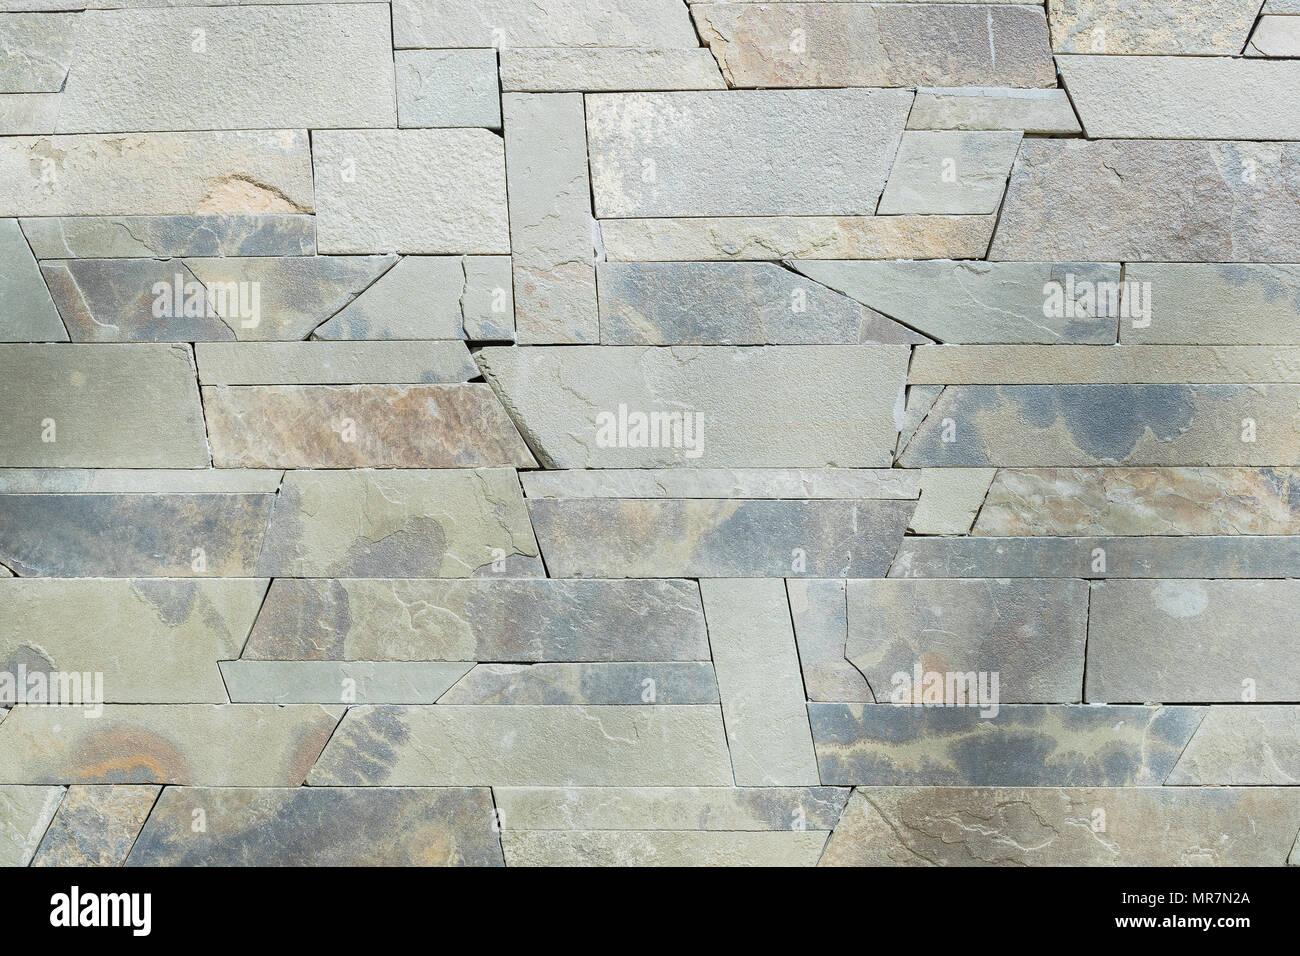 Pietre Bianca Per Interni pietra bianca immagini & pietra bianca fotos stock - alamy